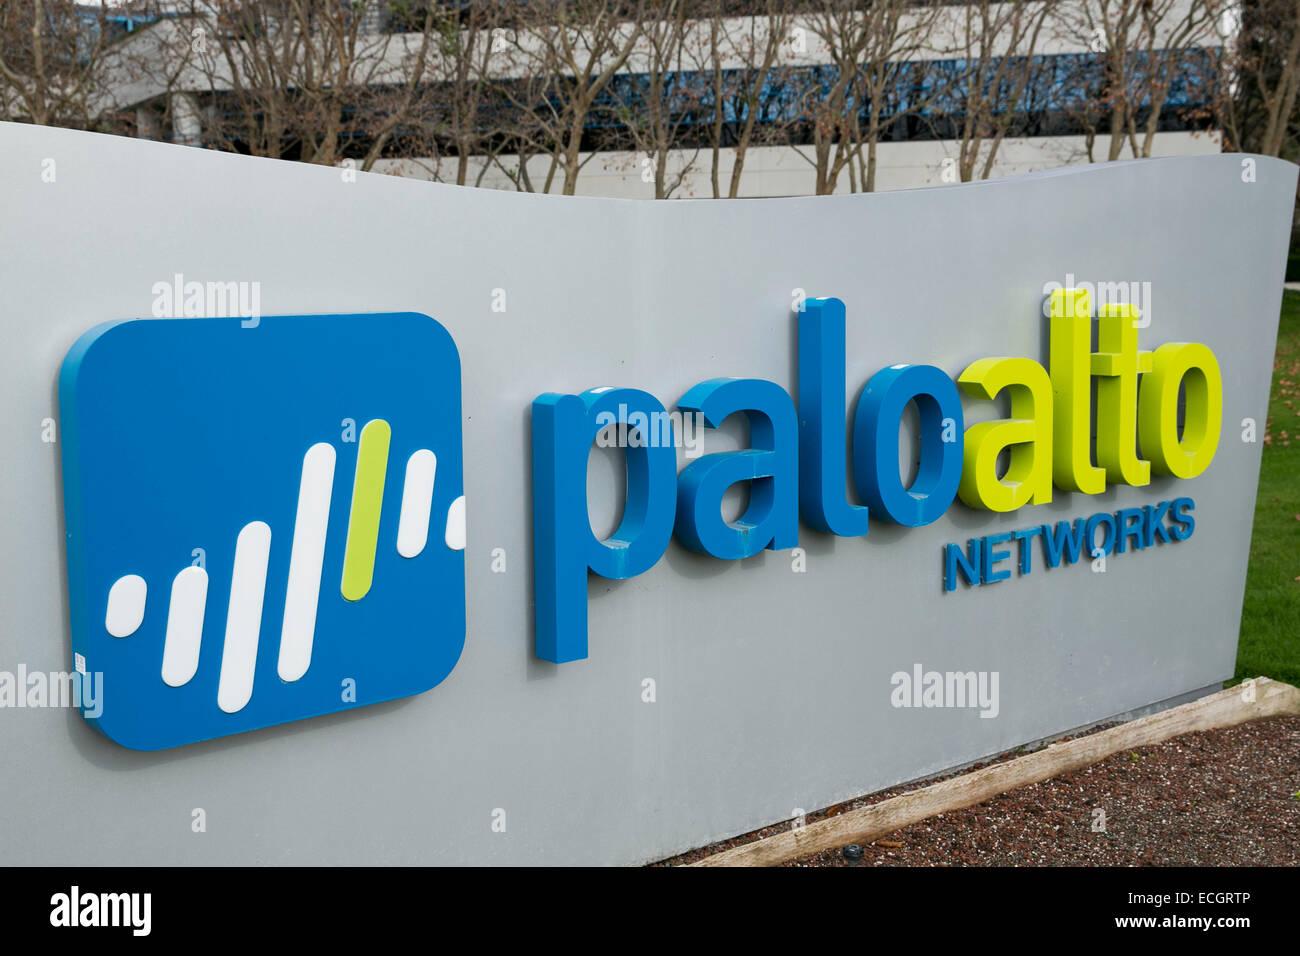 Palo alto sign headquarters stock photos palo alto sign the headquarters of palo alto networks stock image biocorpaavc